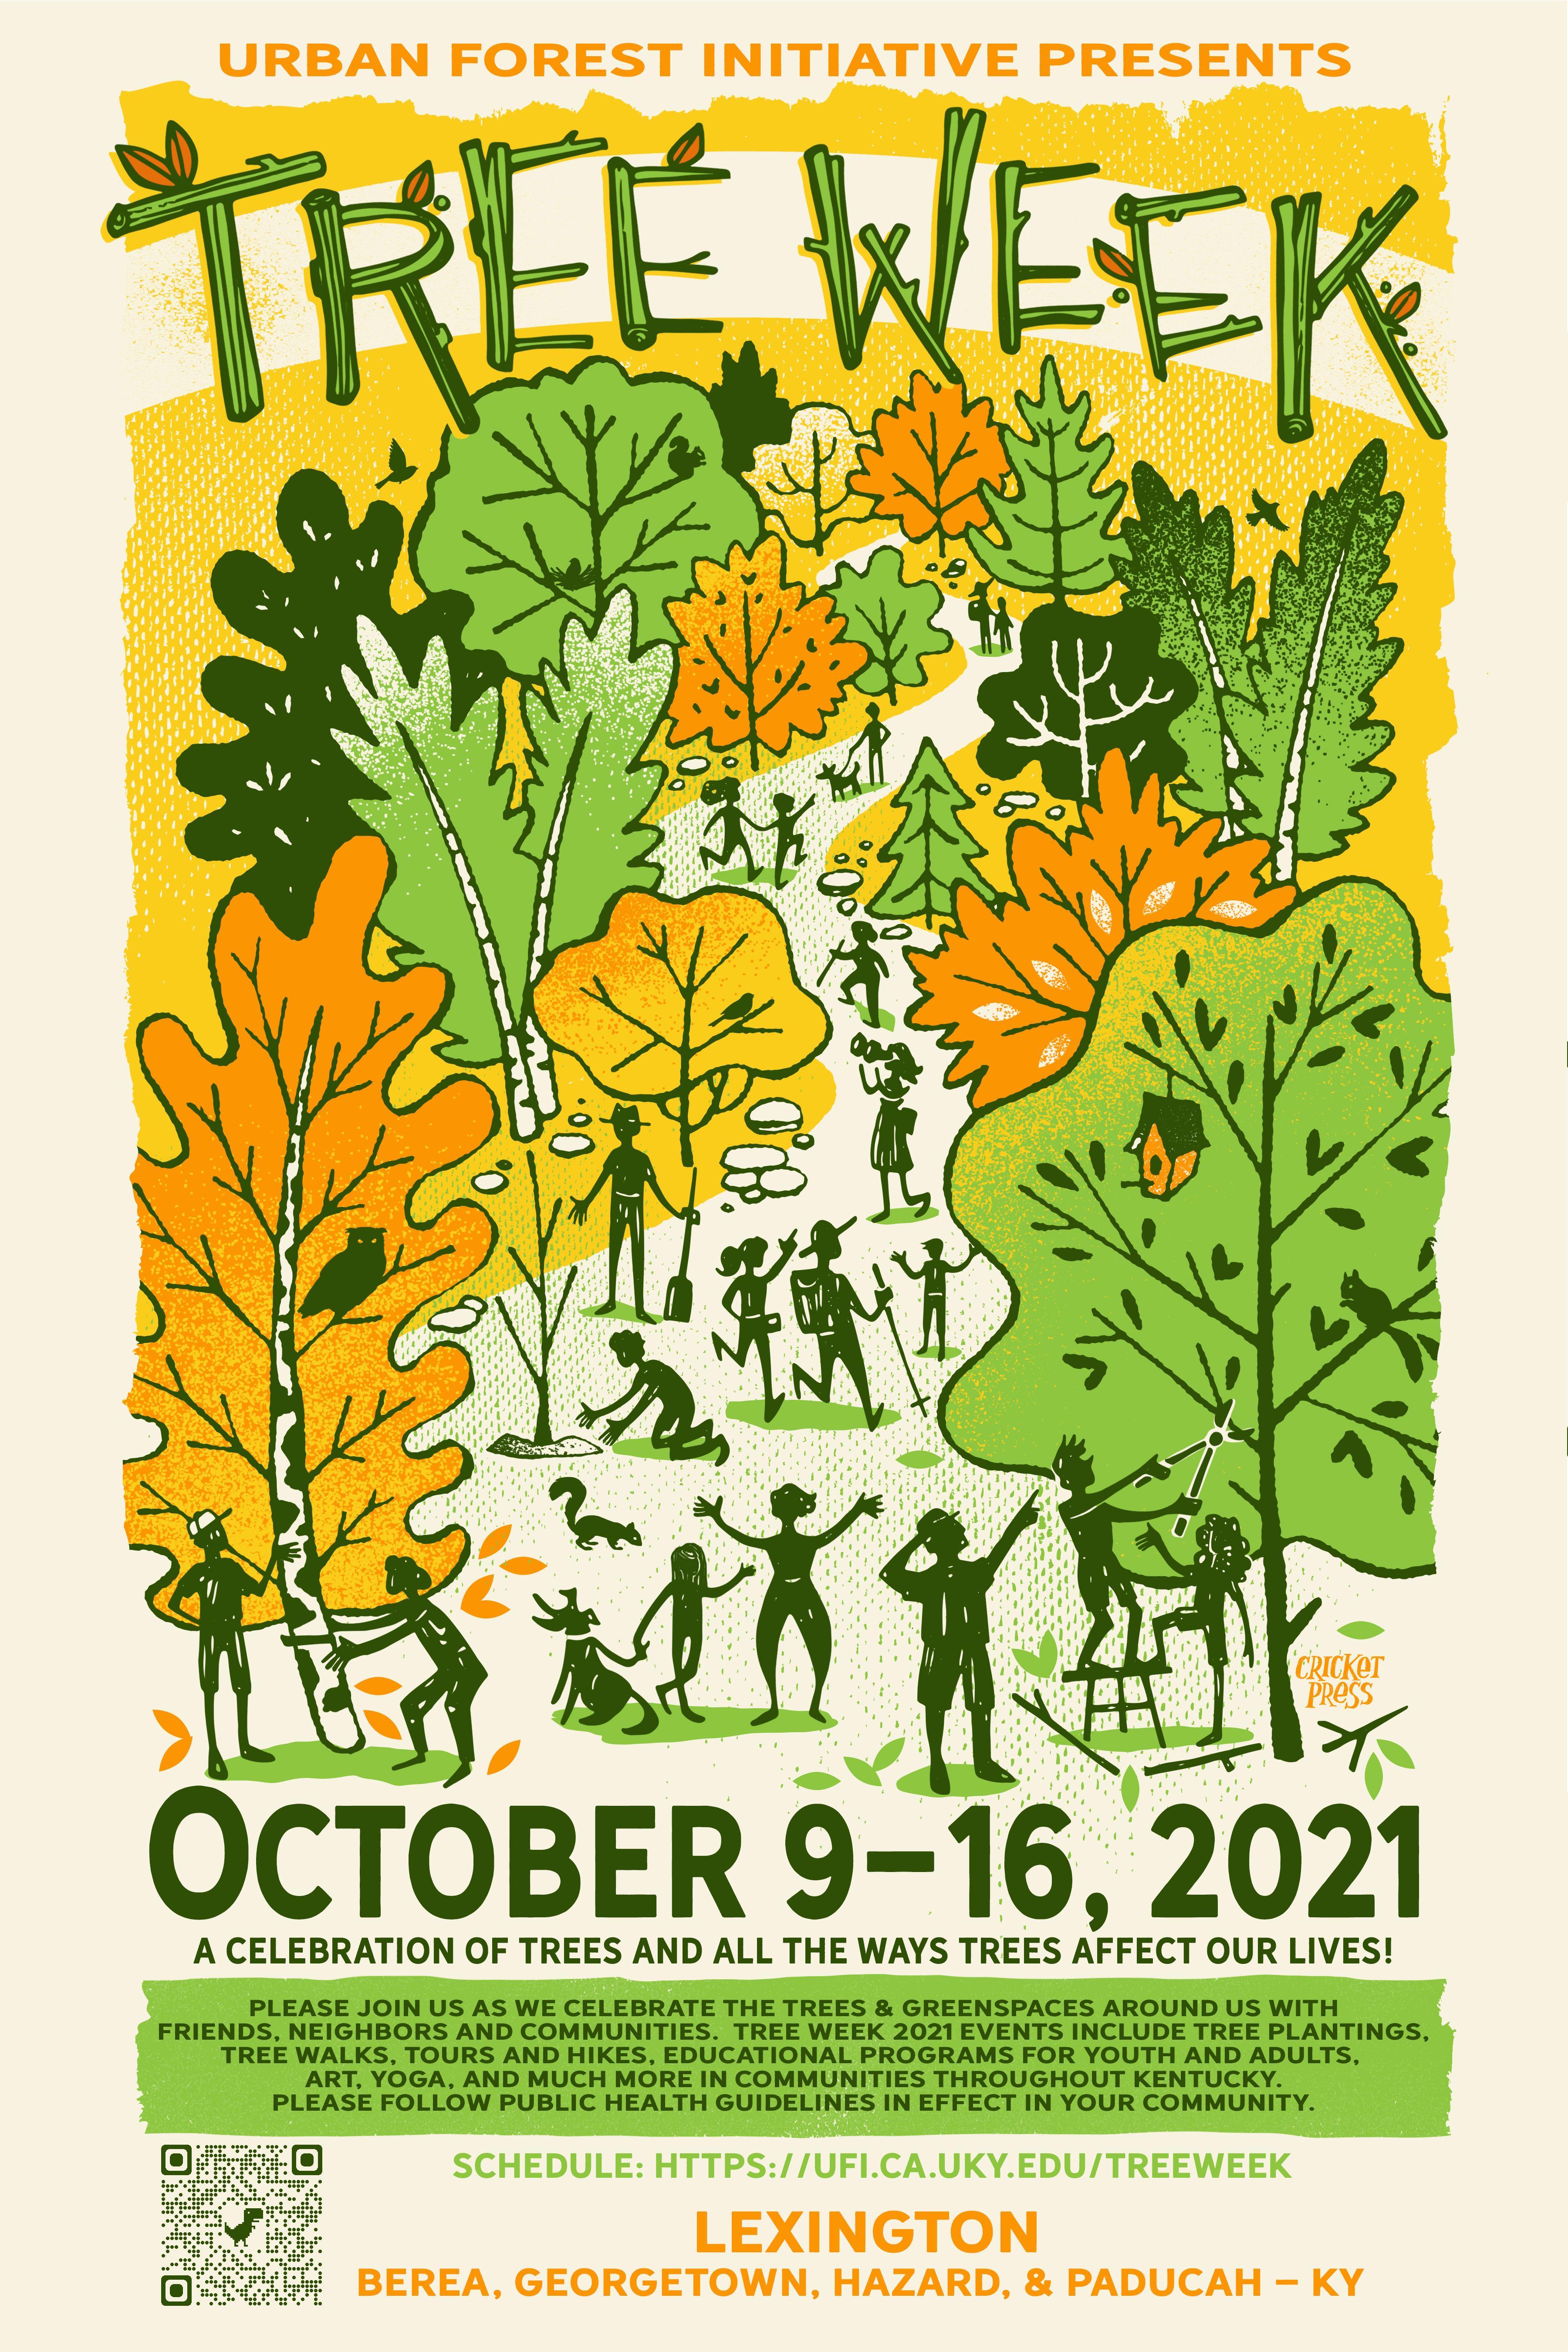 urban forest initiative tree week 2021